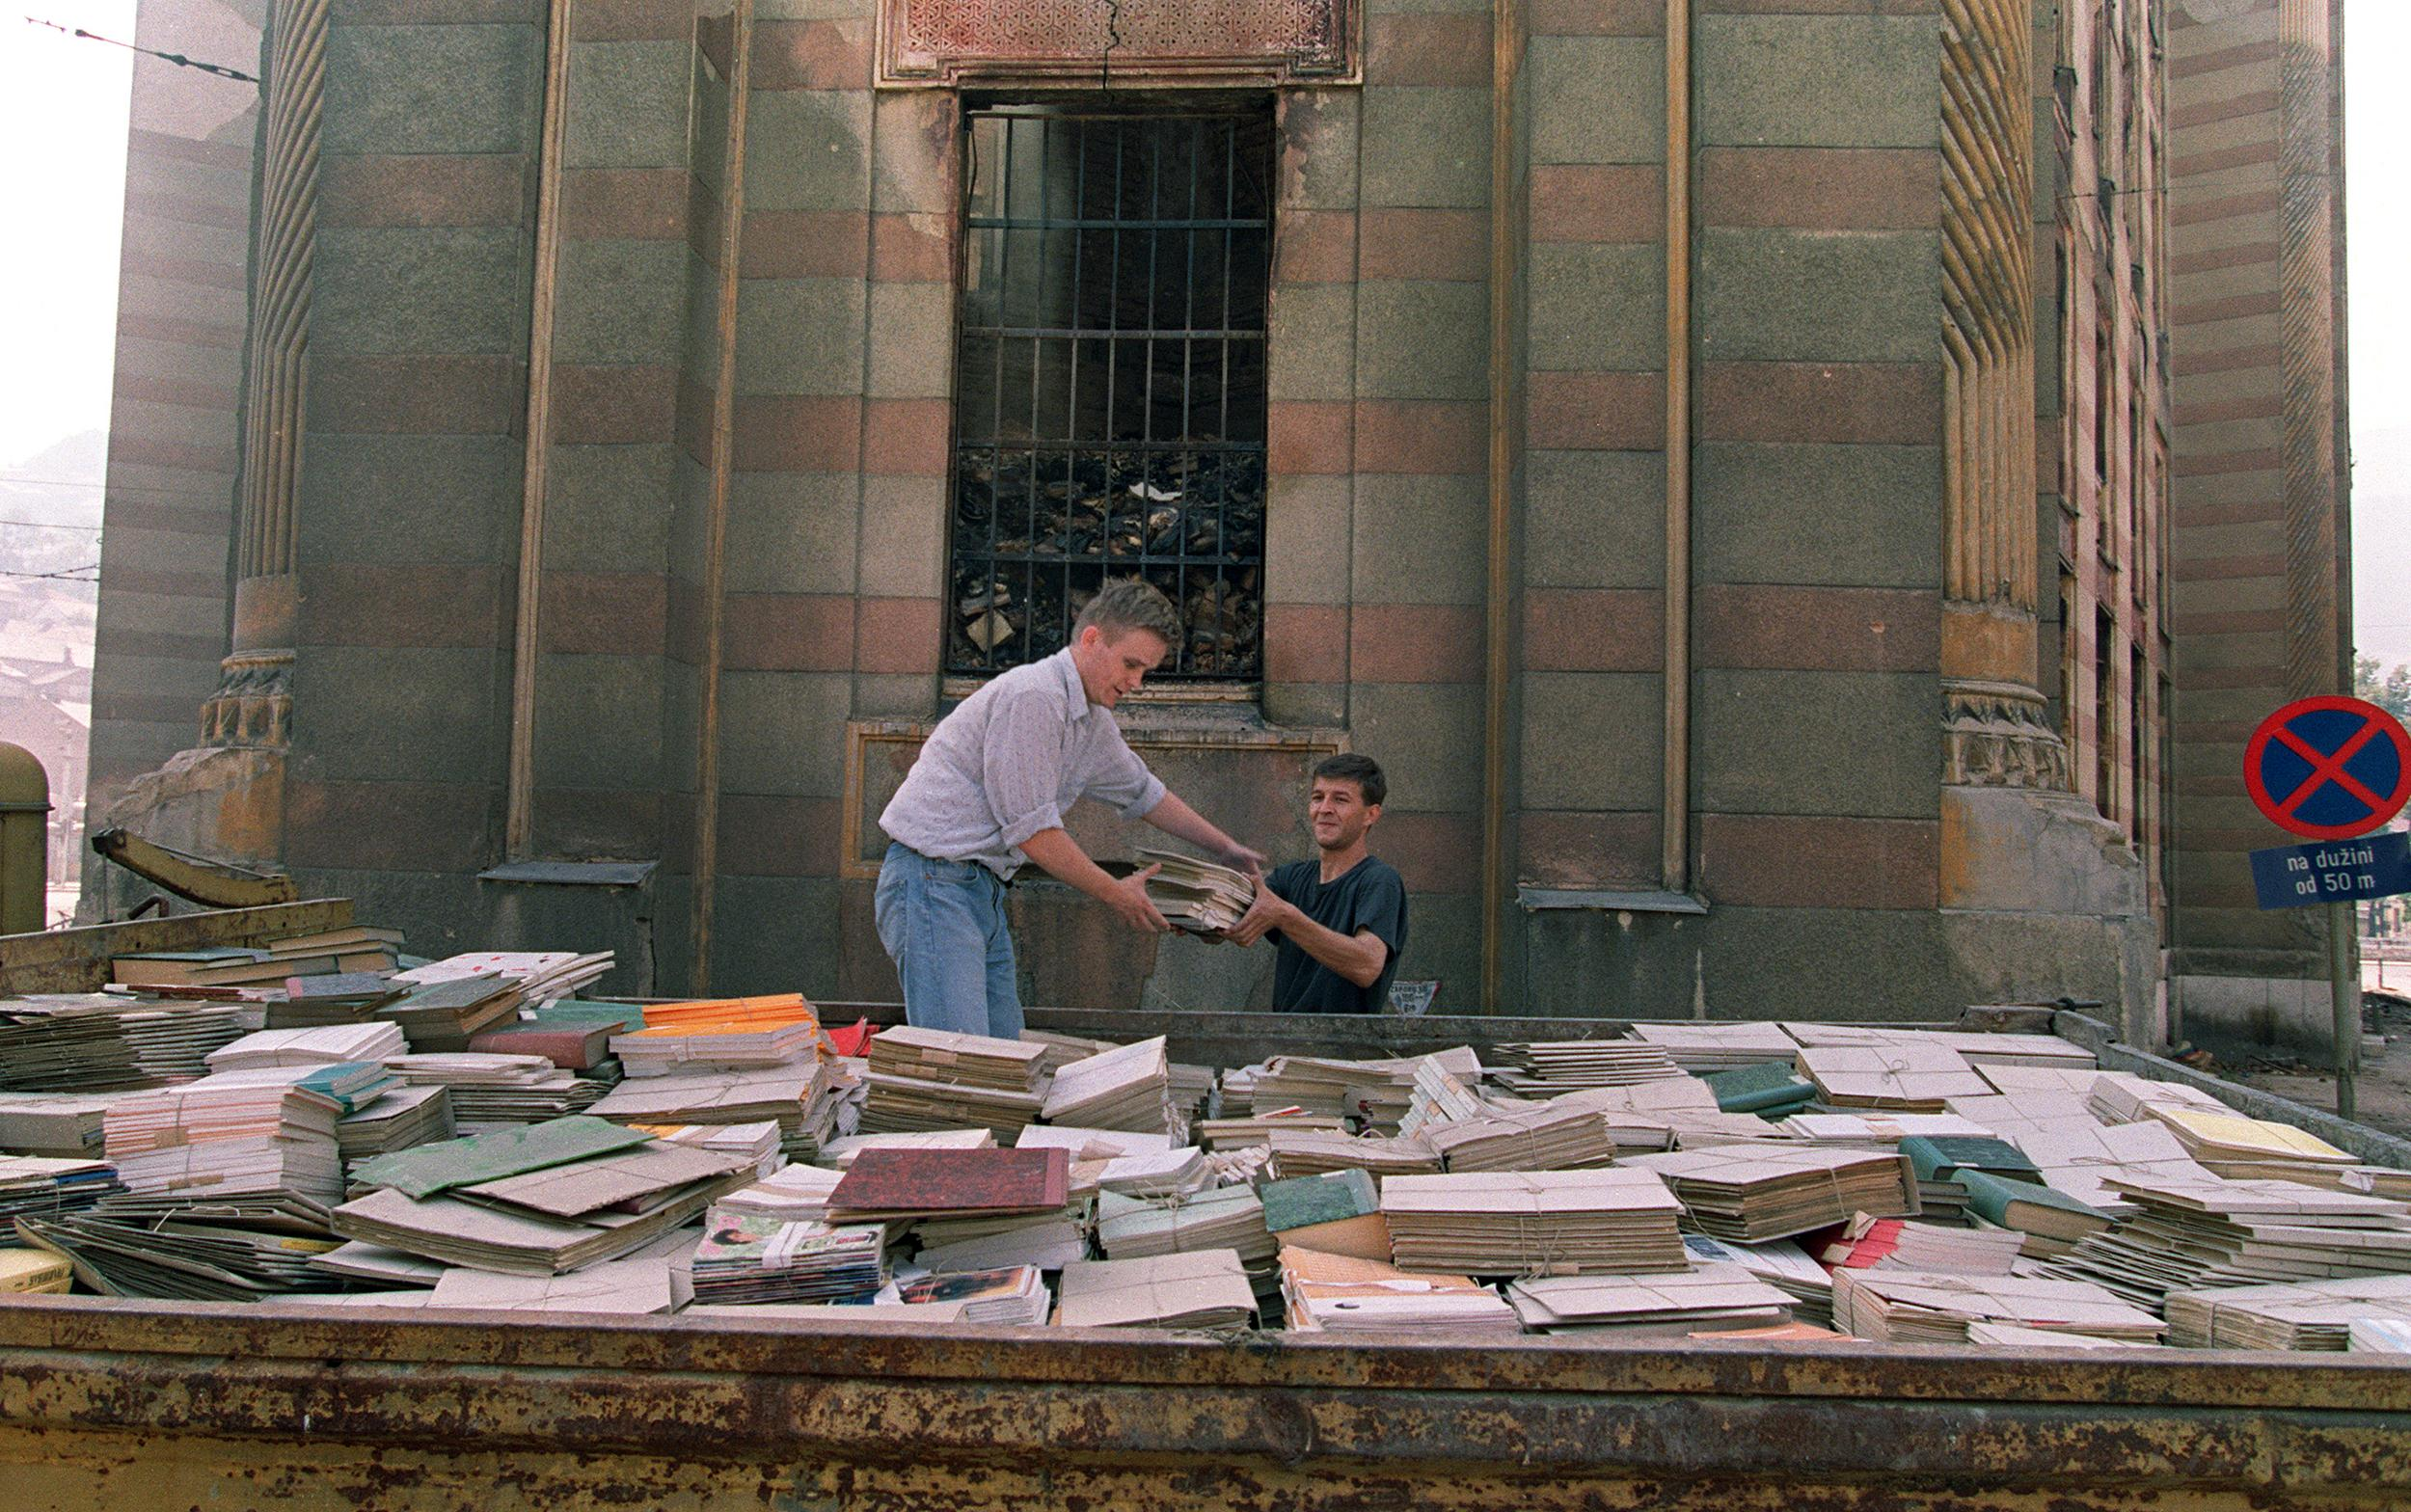 Volontari recuperano i libri